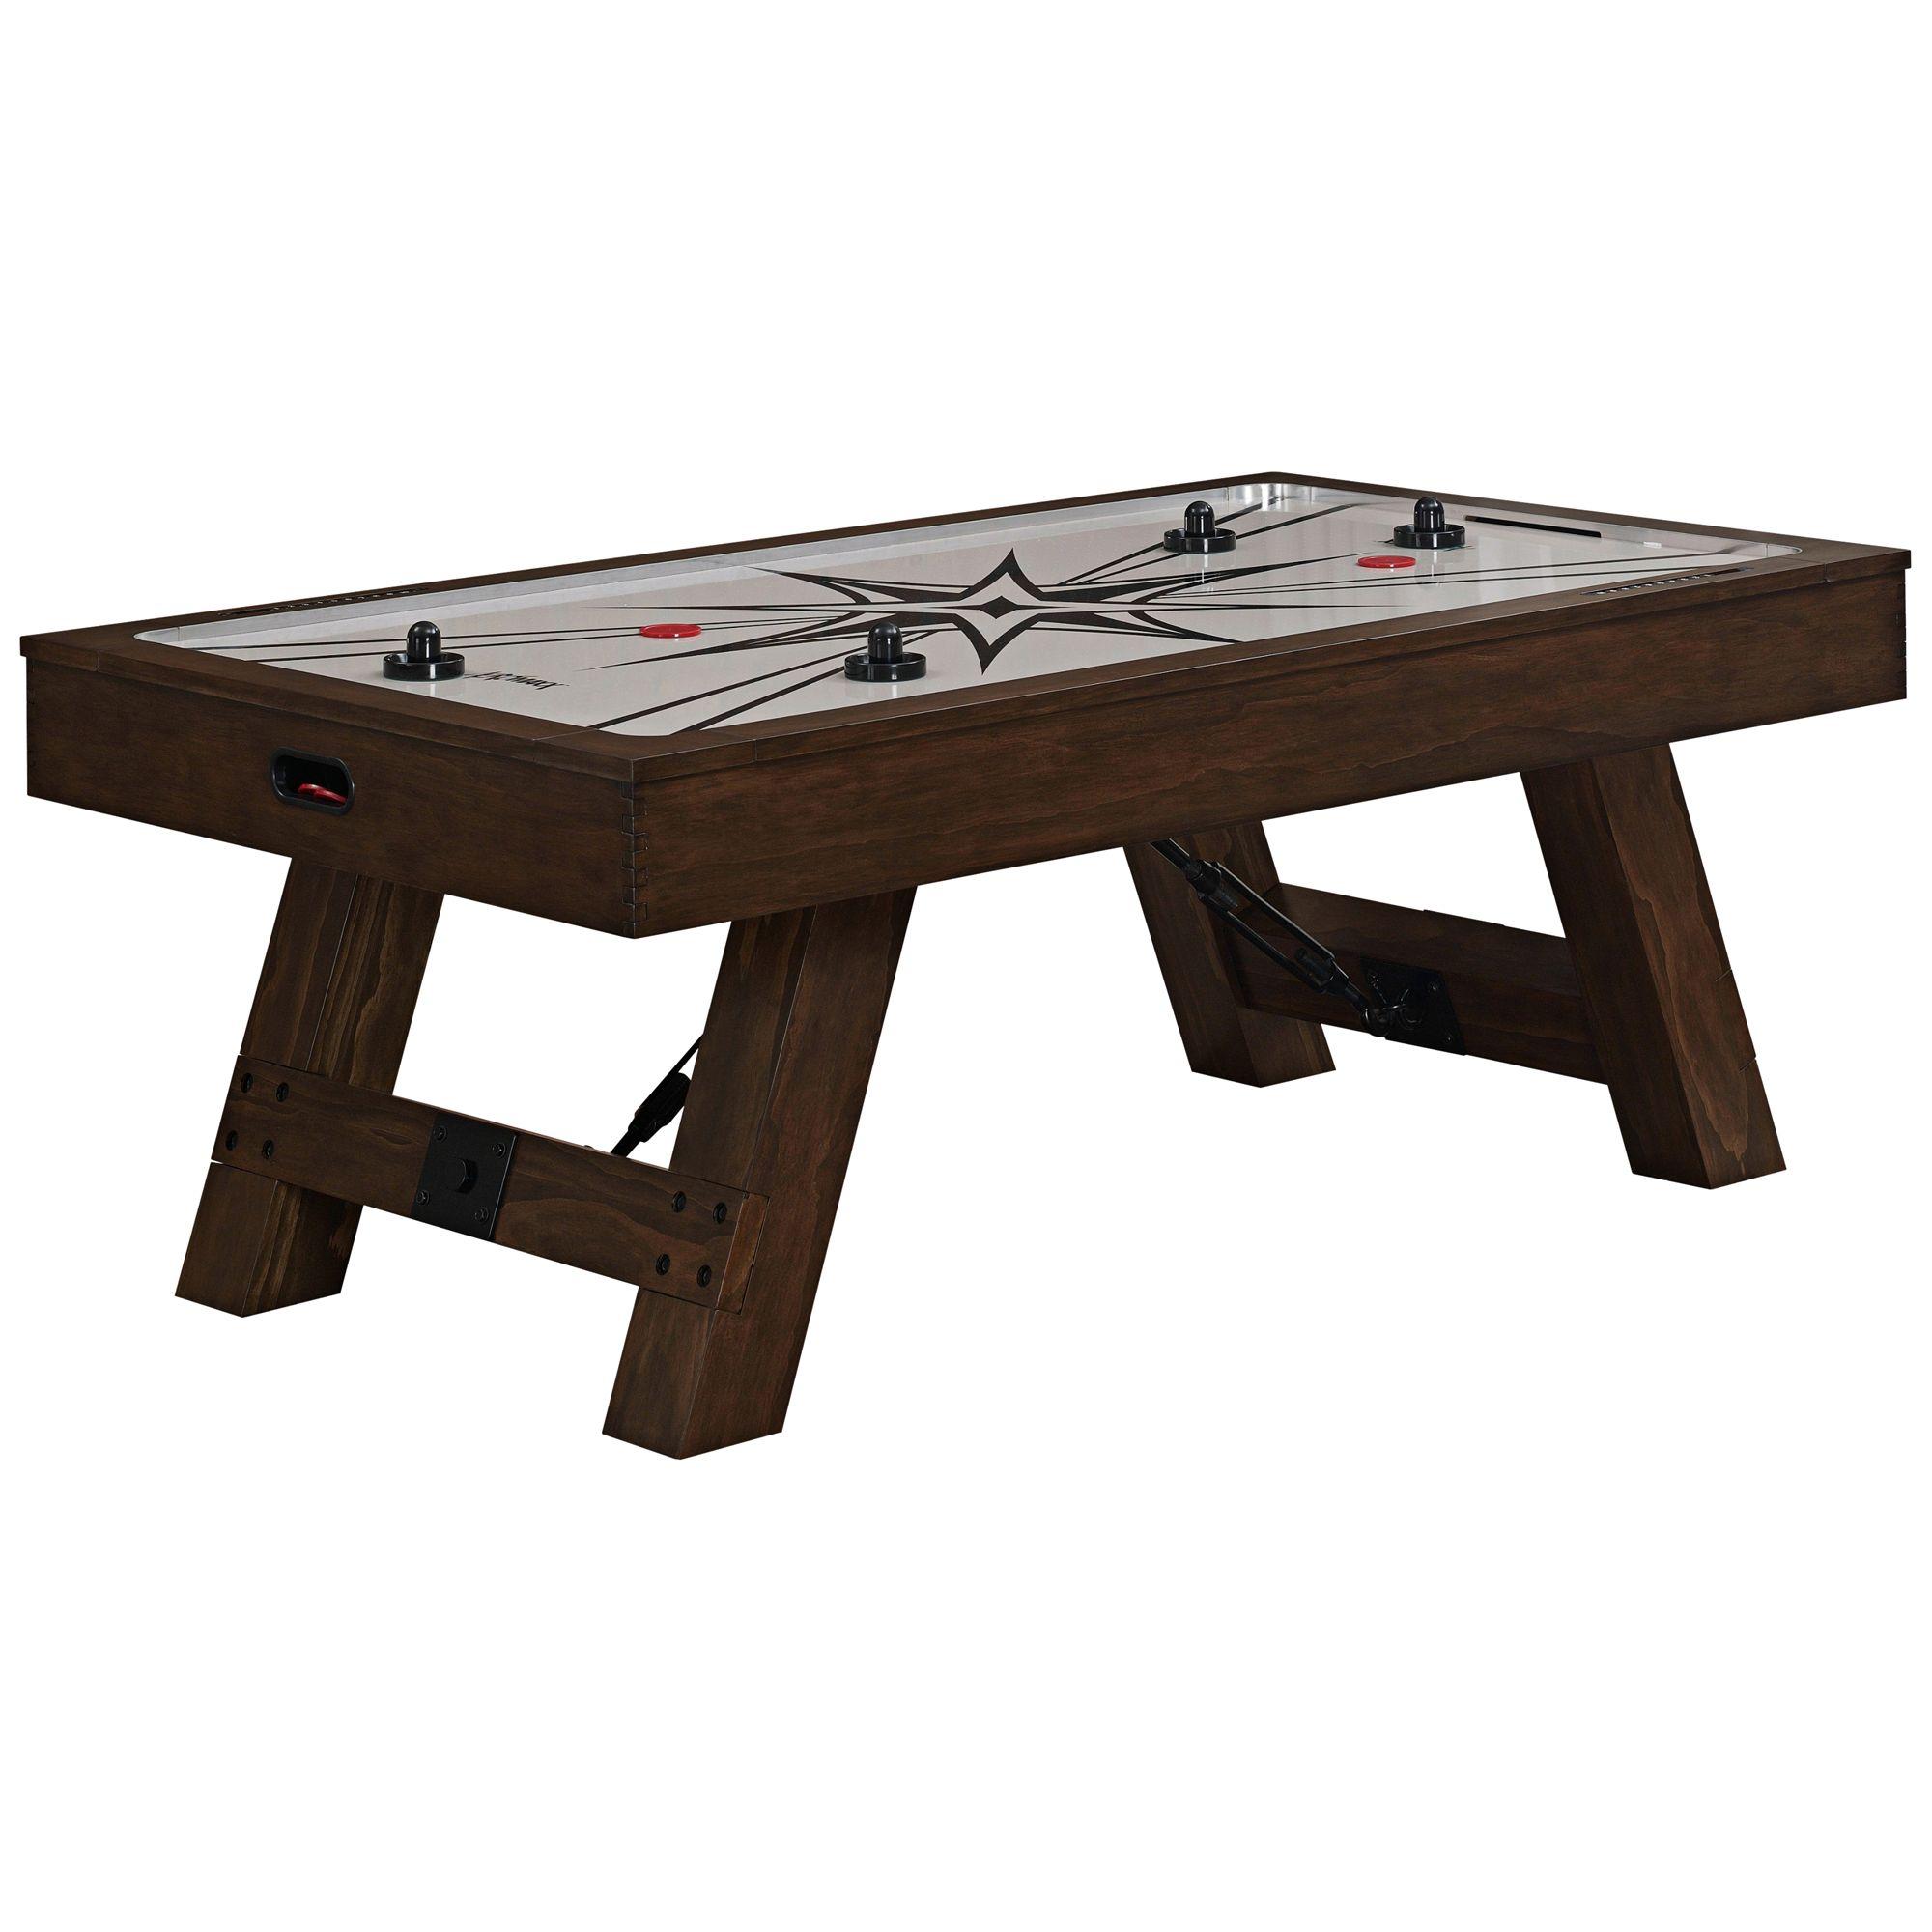 Incroyable American Heritage Savannah Wood Air Hockey Table